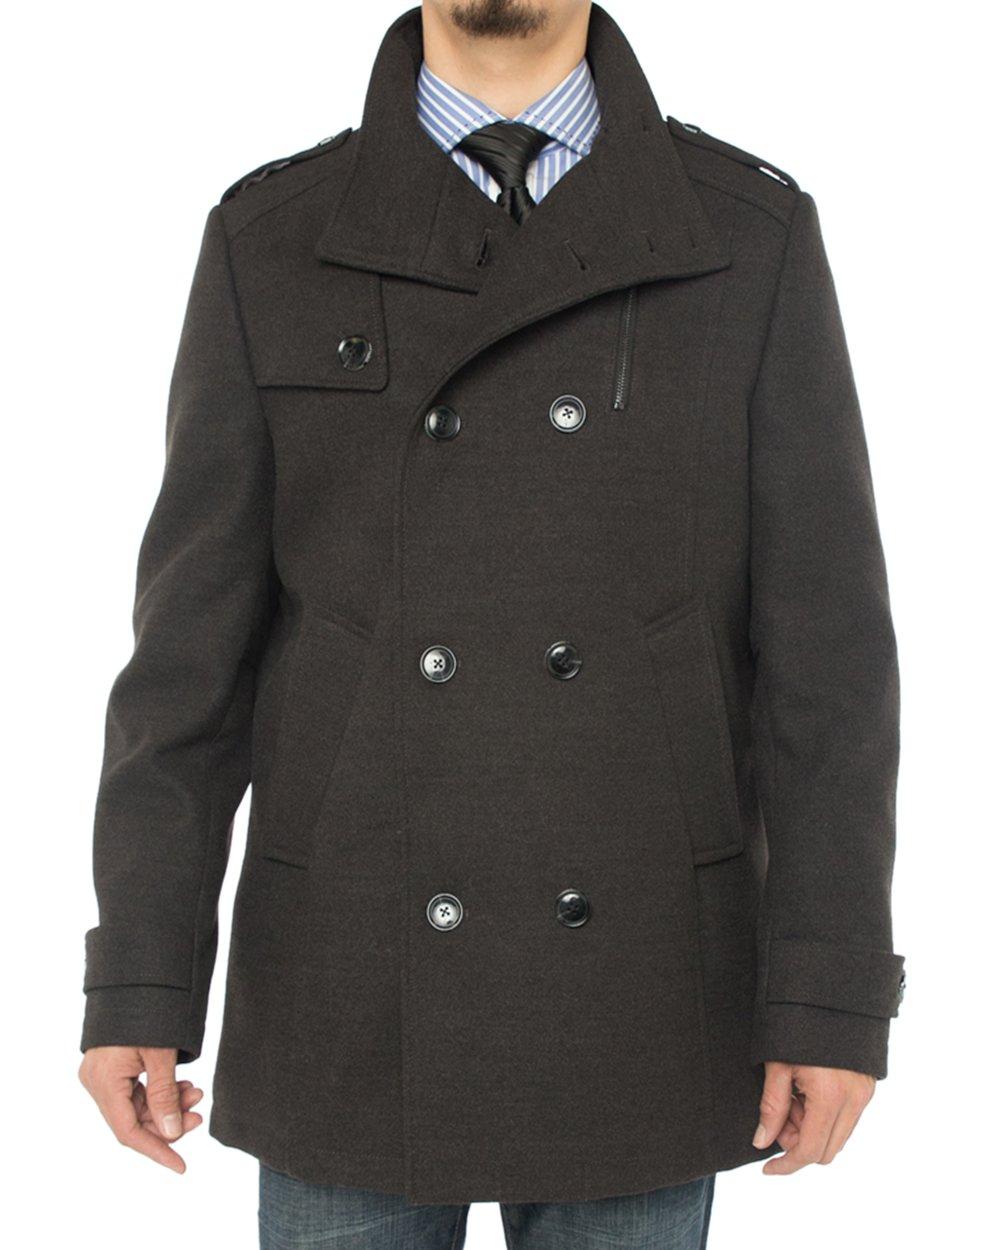 Luciano Natazzi Men's Stylish Top Coat Classic Double Breasted Pea Coat (44 US - 54 EU, Charcoal Gray)